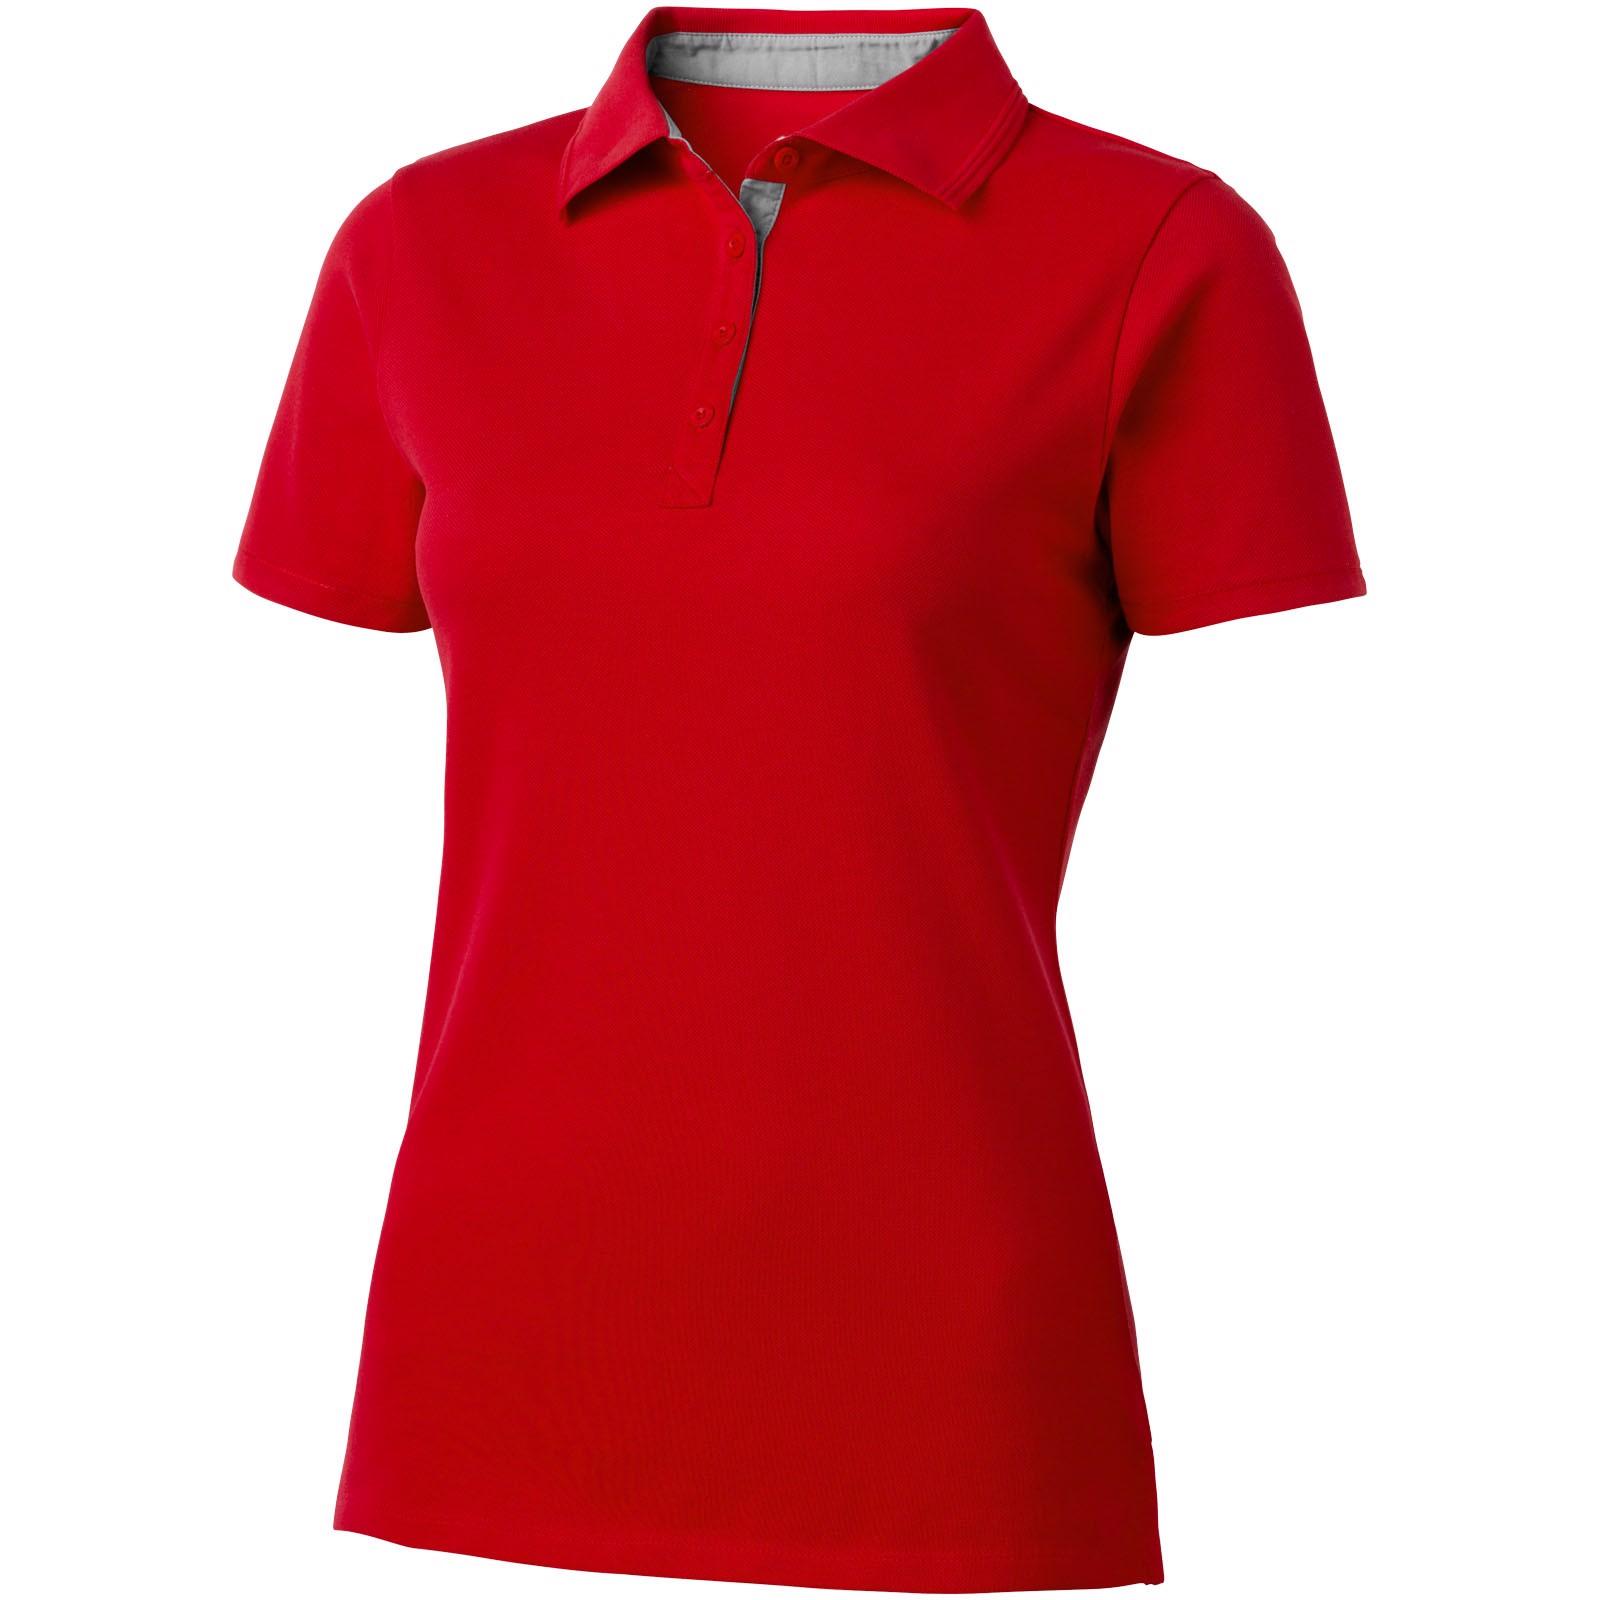 Hacker Poloshirt für Damen - Rot / Grau / L